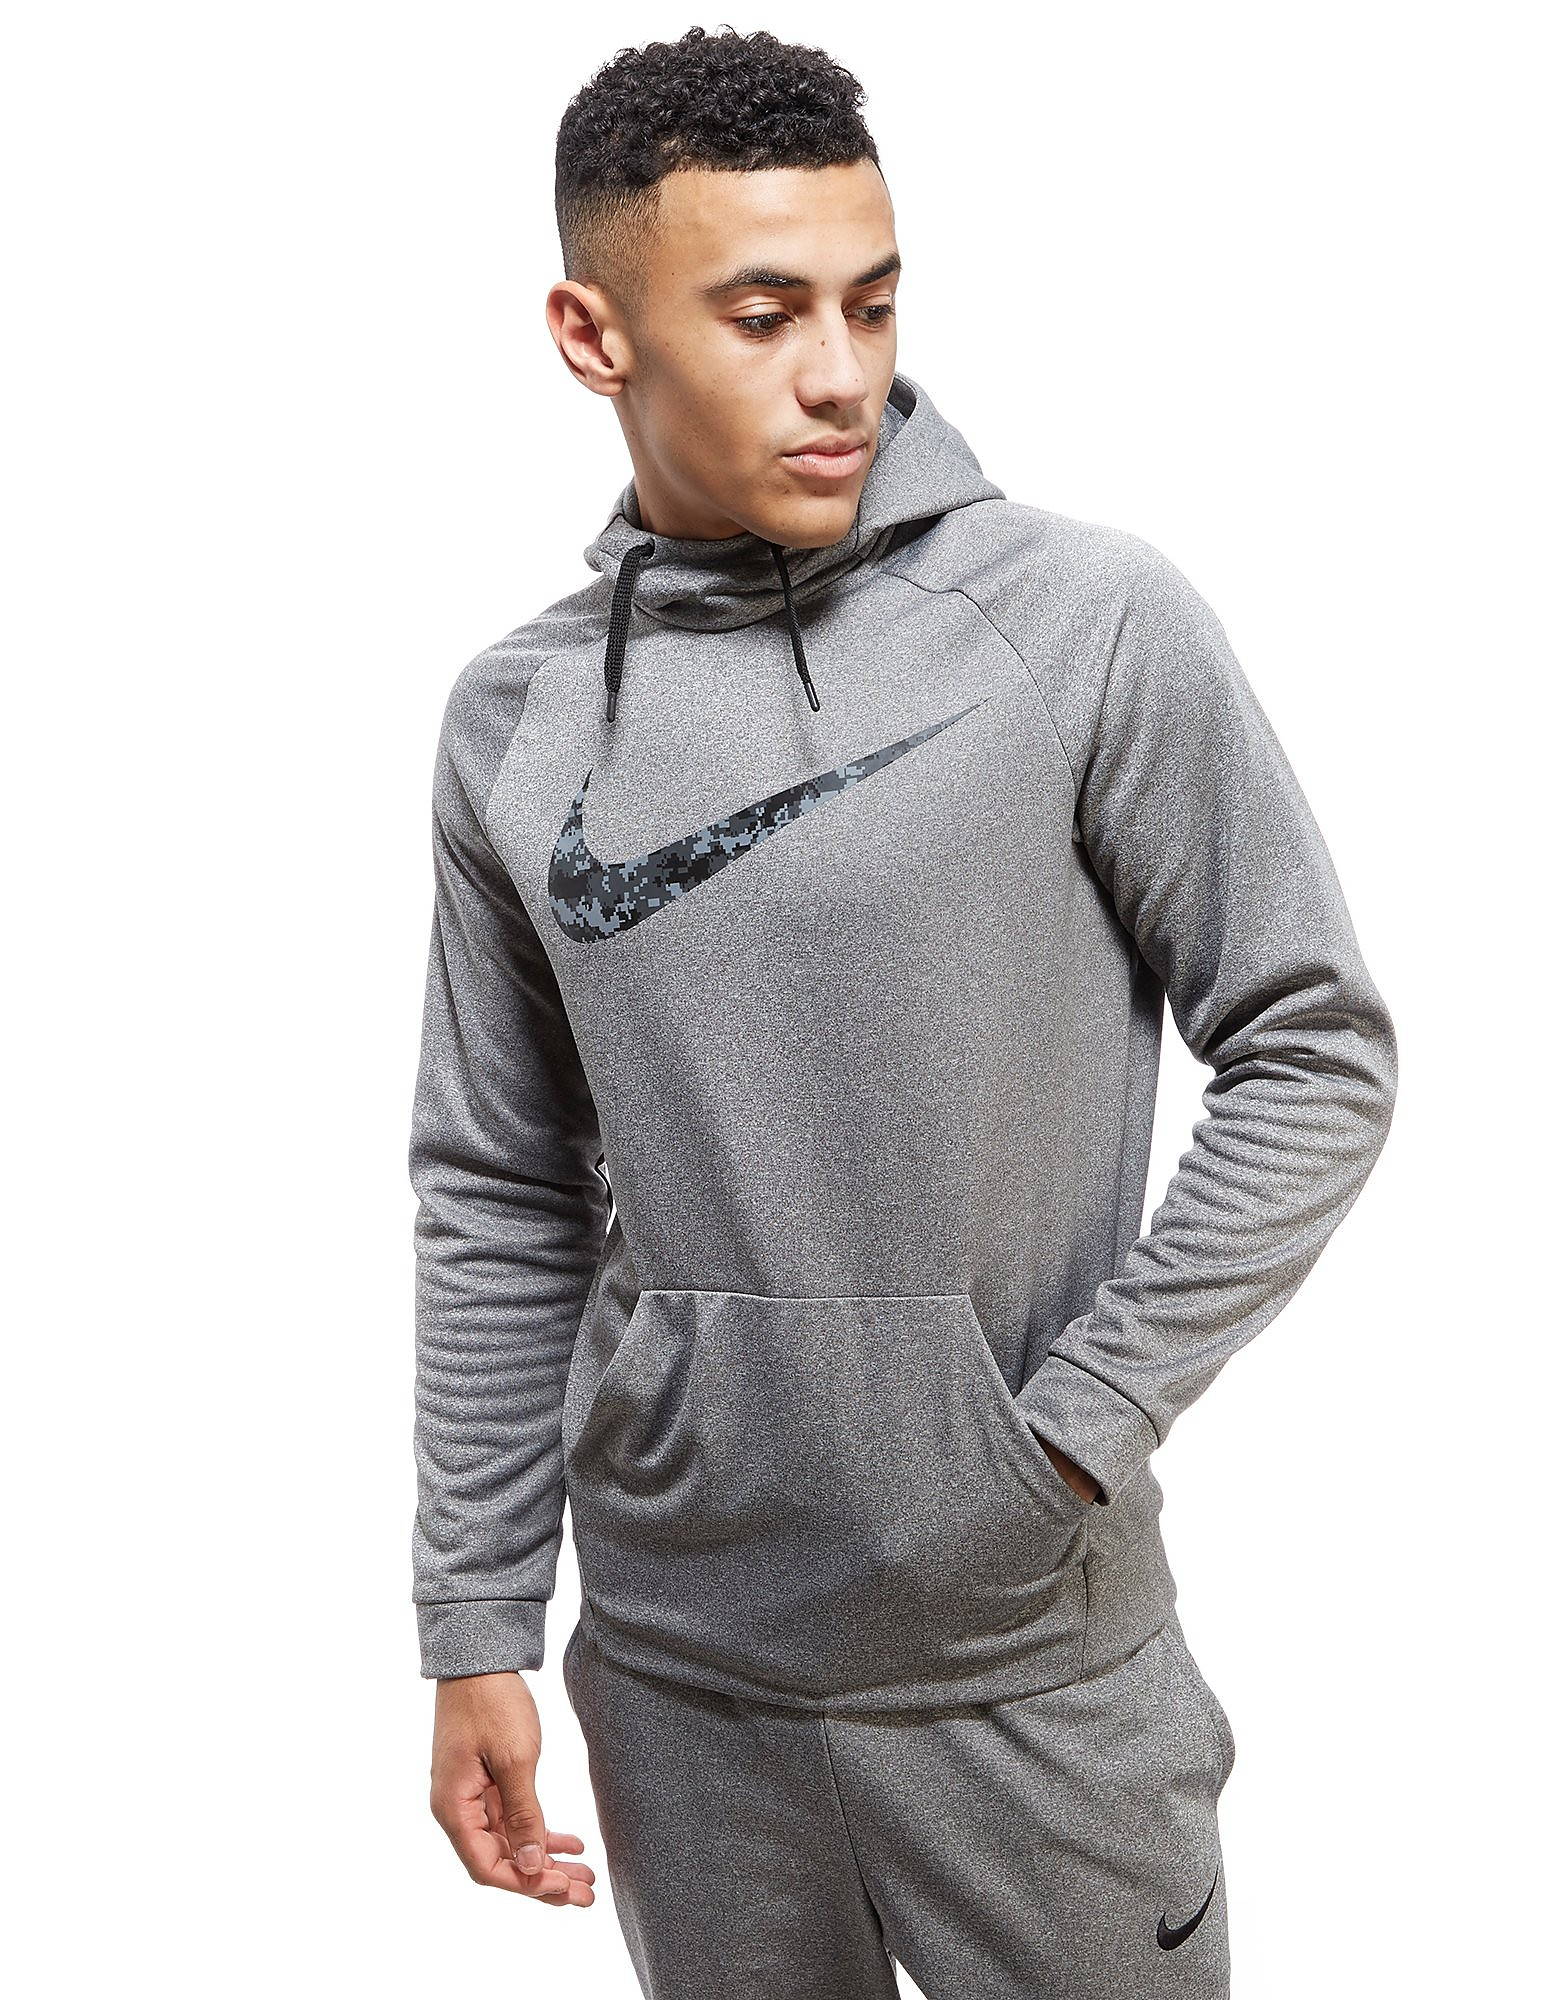 Nike Train Therma Hoody